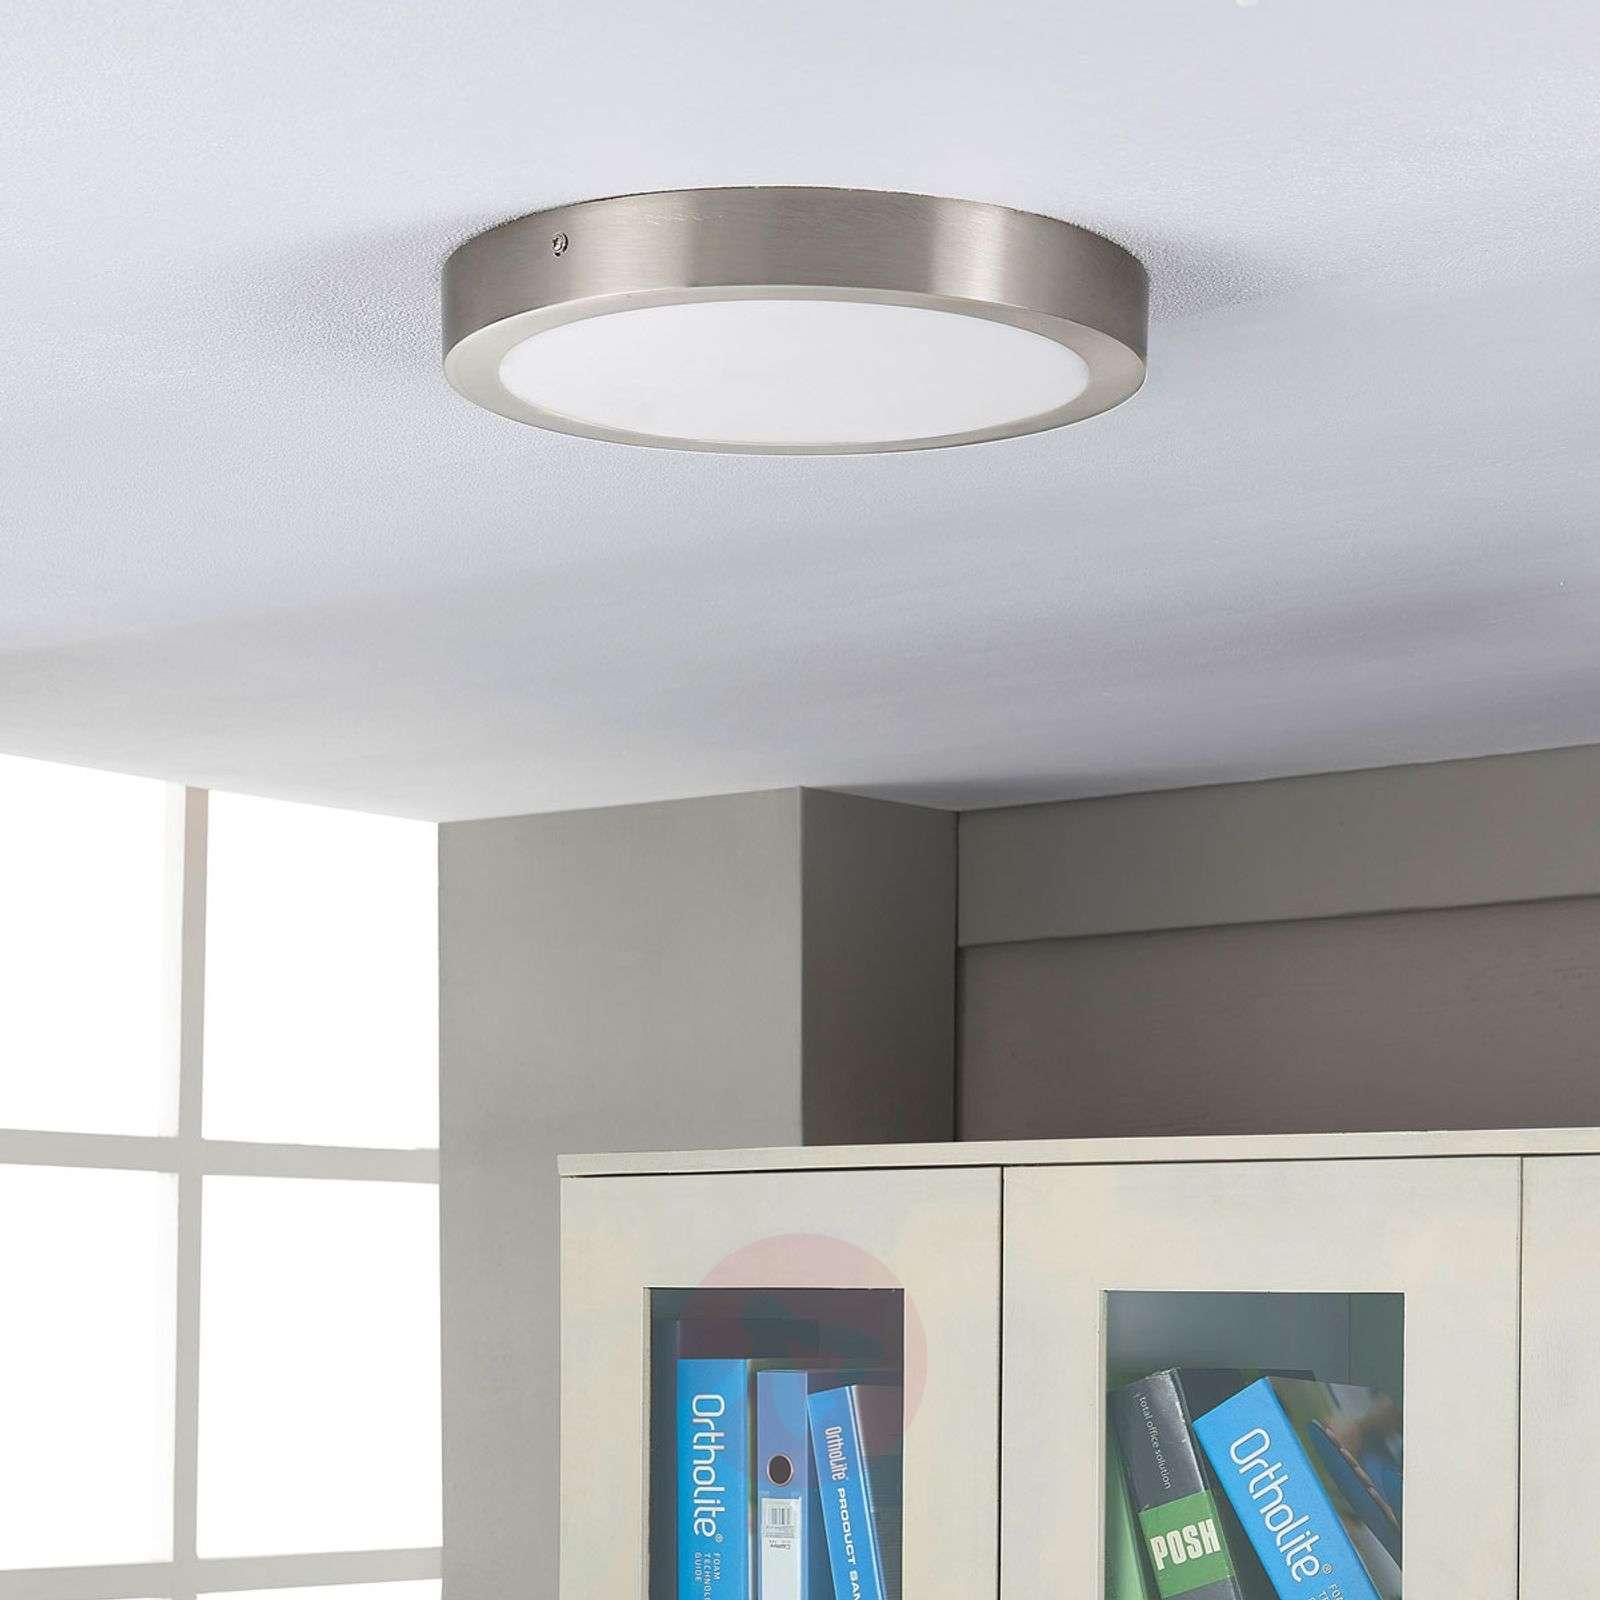 Milea round LED ceiling light-9620945-02